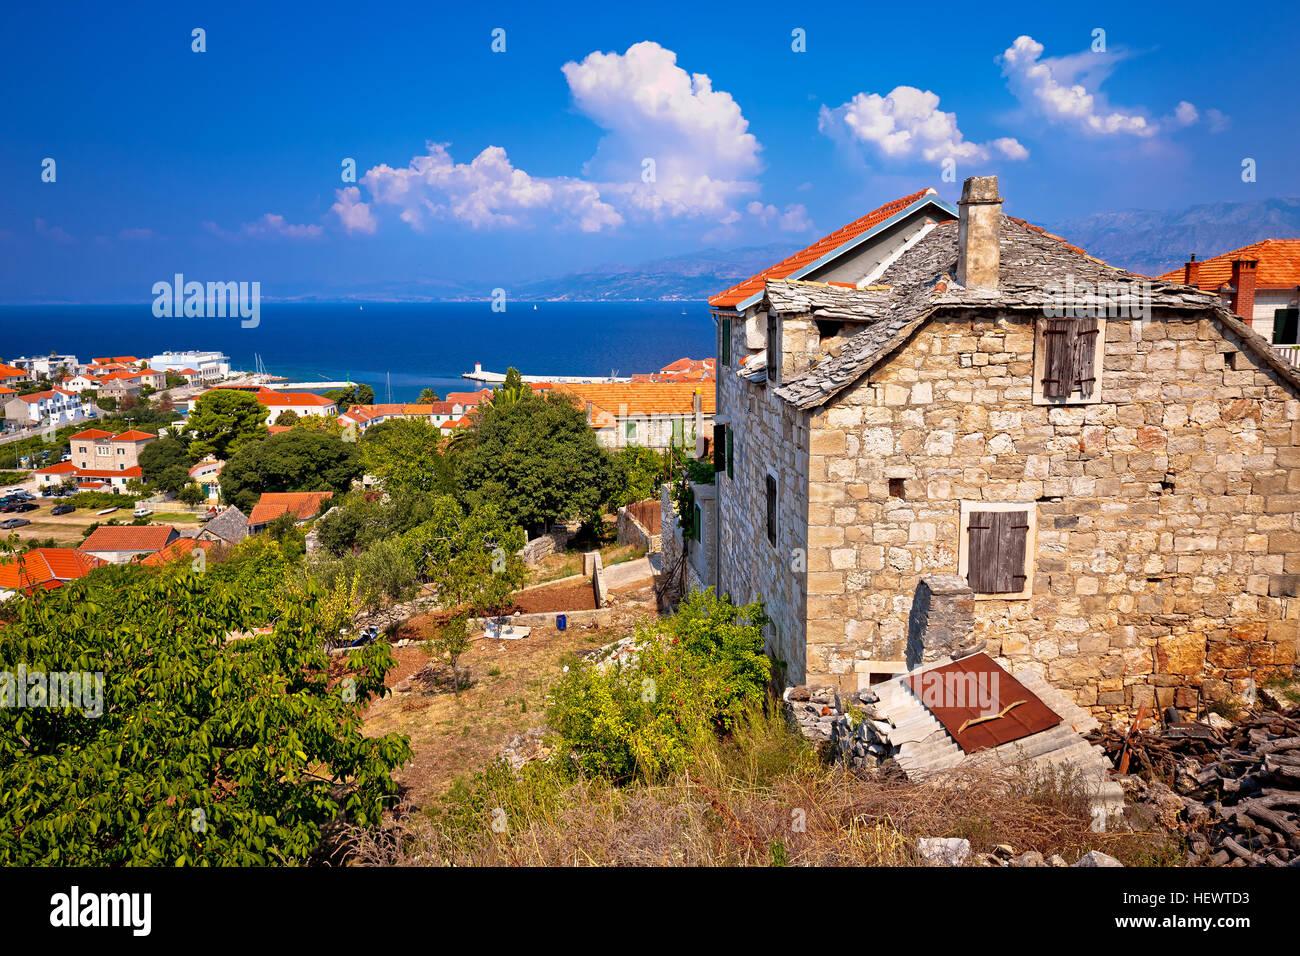 Old stone village Postira on Brac island, coast of Dalmatia, Croatia - Stock Image